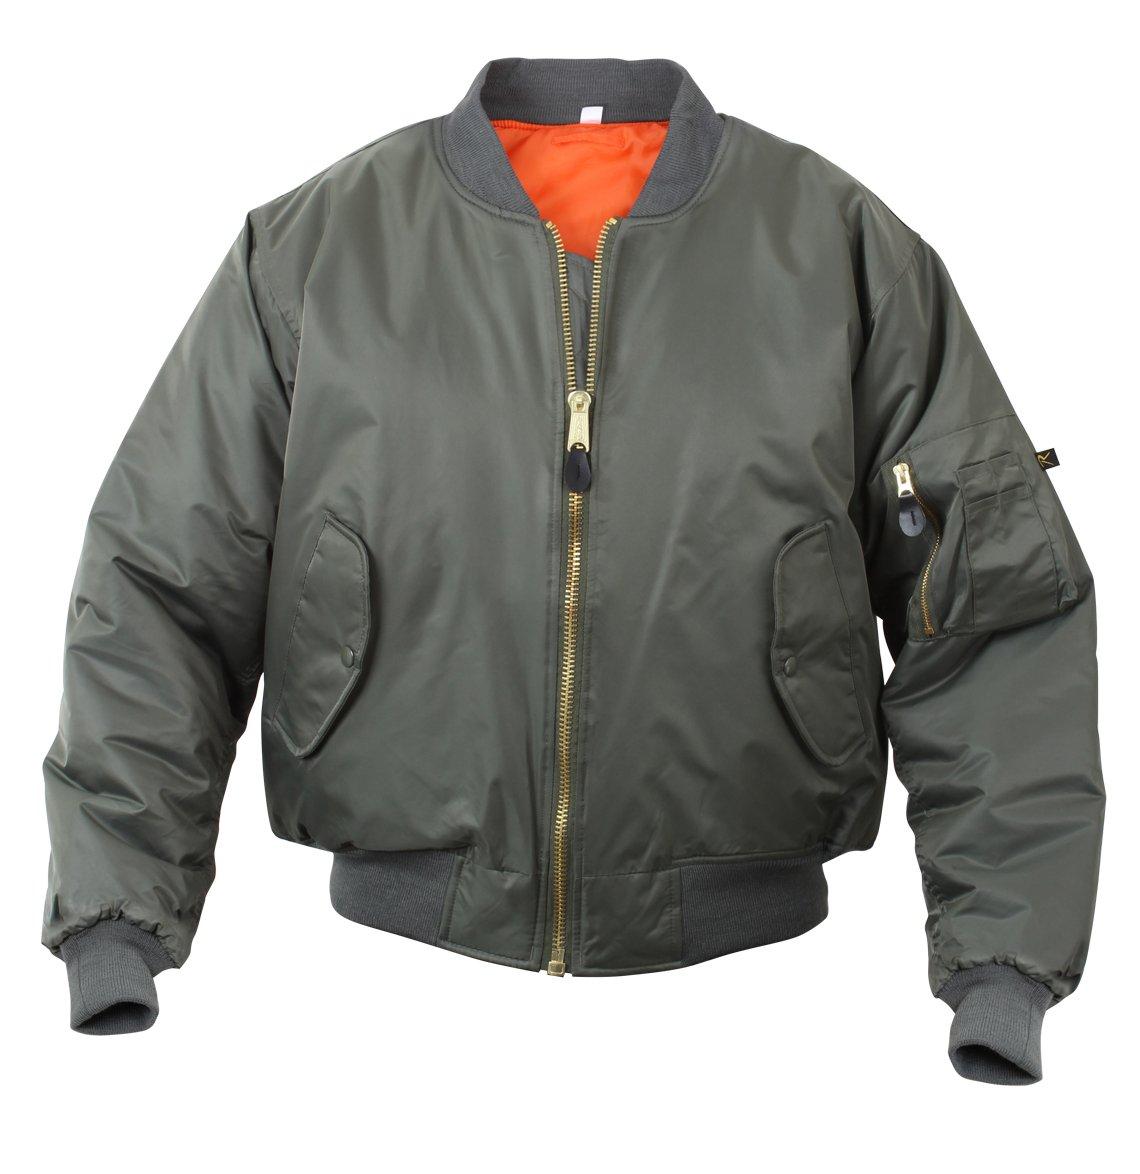 Rothco %Rothco Ma-1 Flight Jacket-Sage, Large